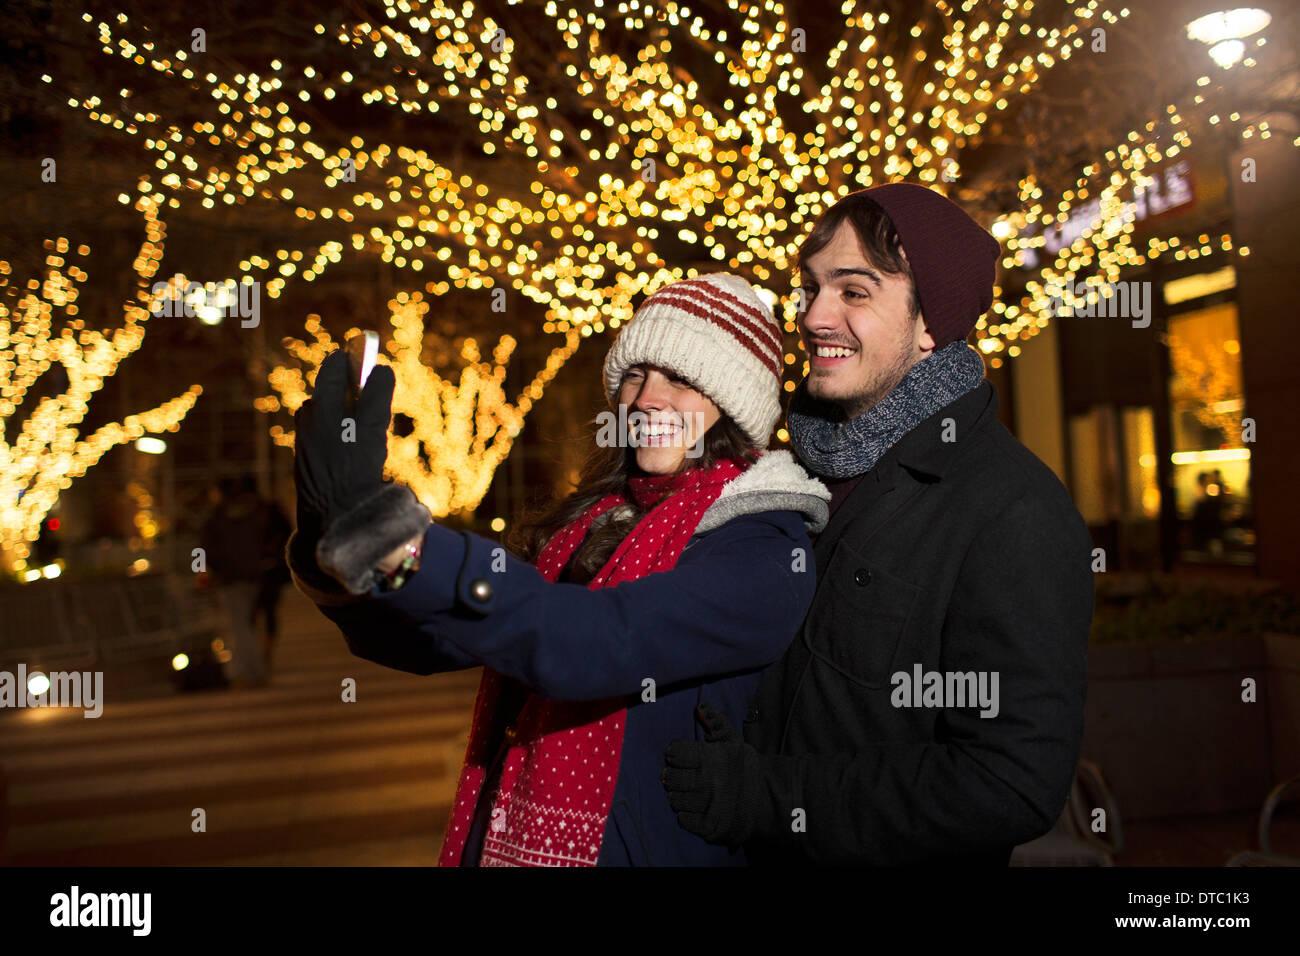 Young couple enjoying christmas celebrations on street - Stock Image